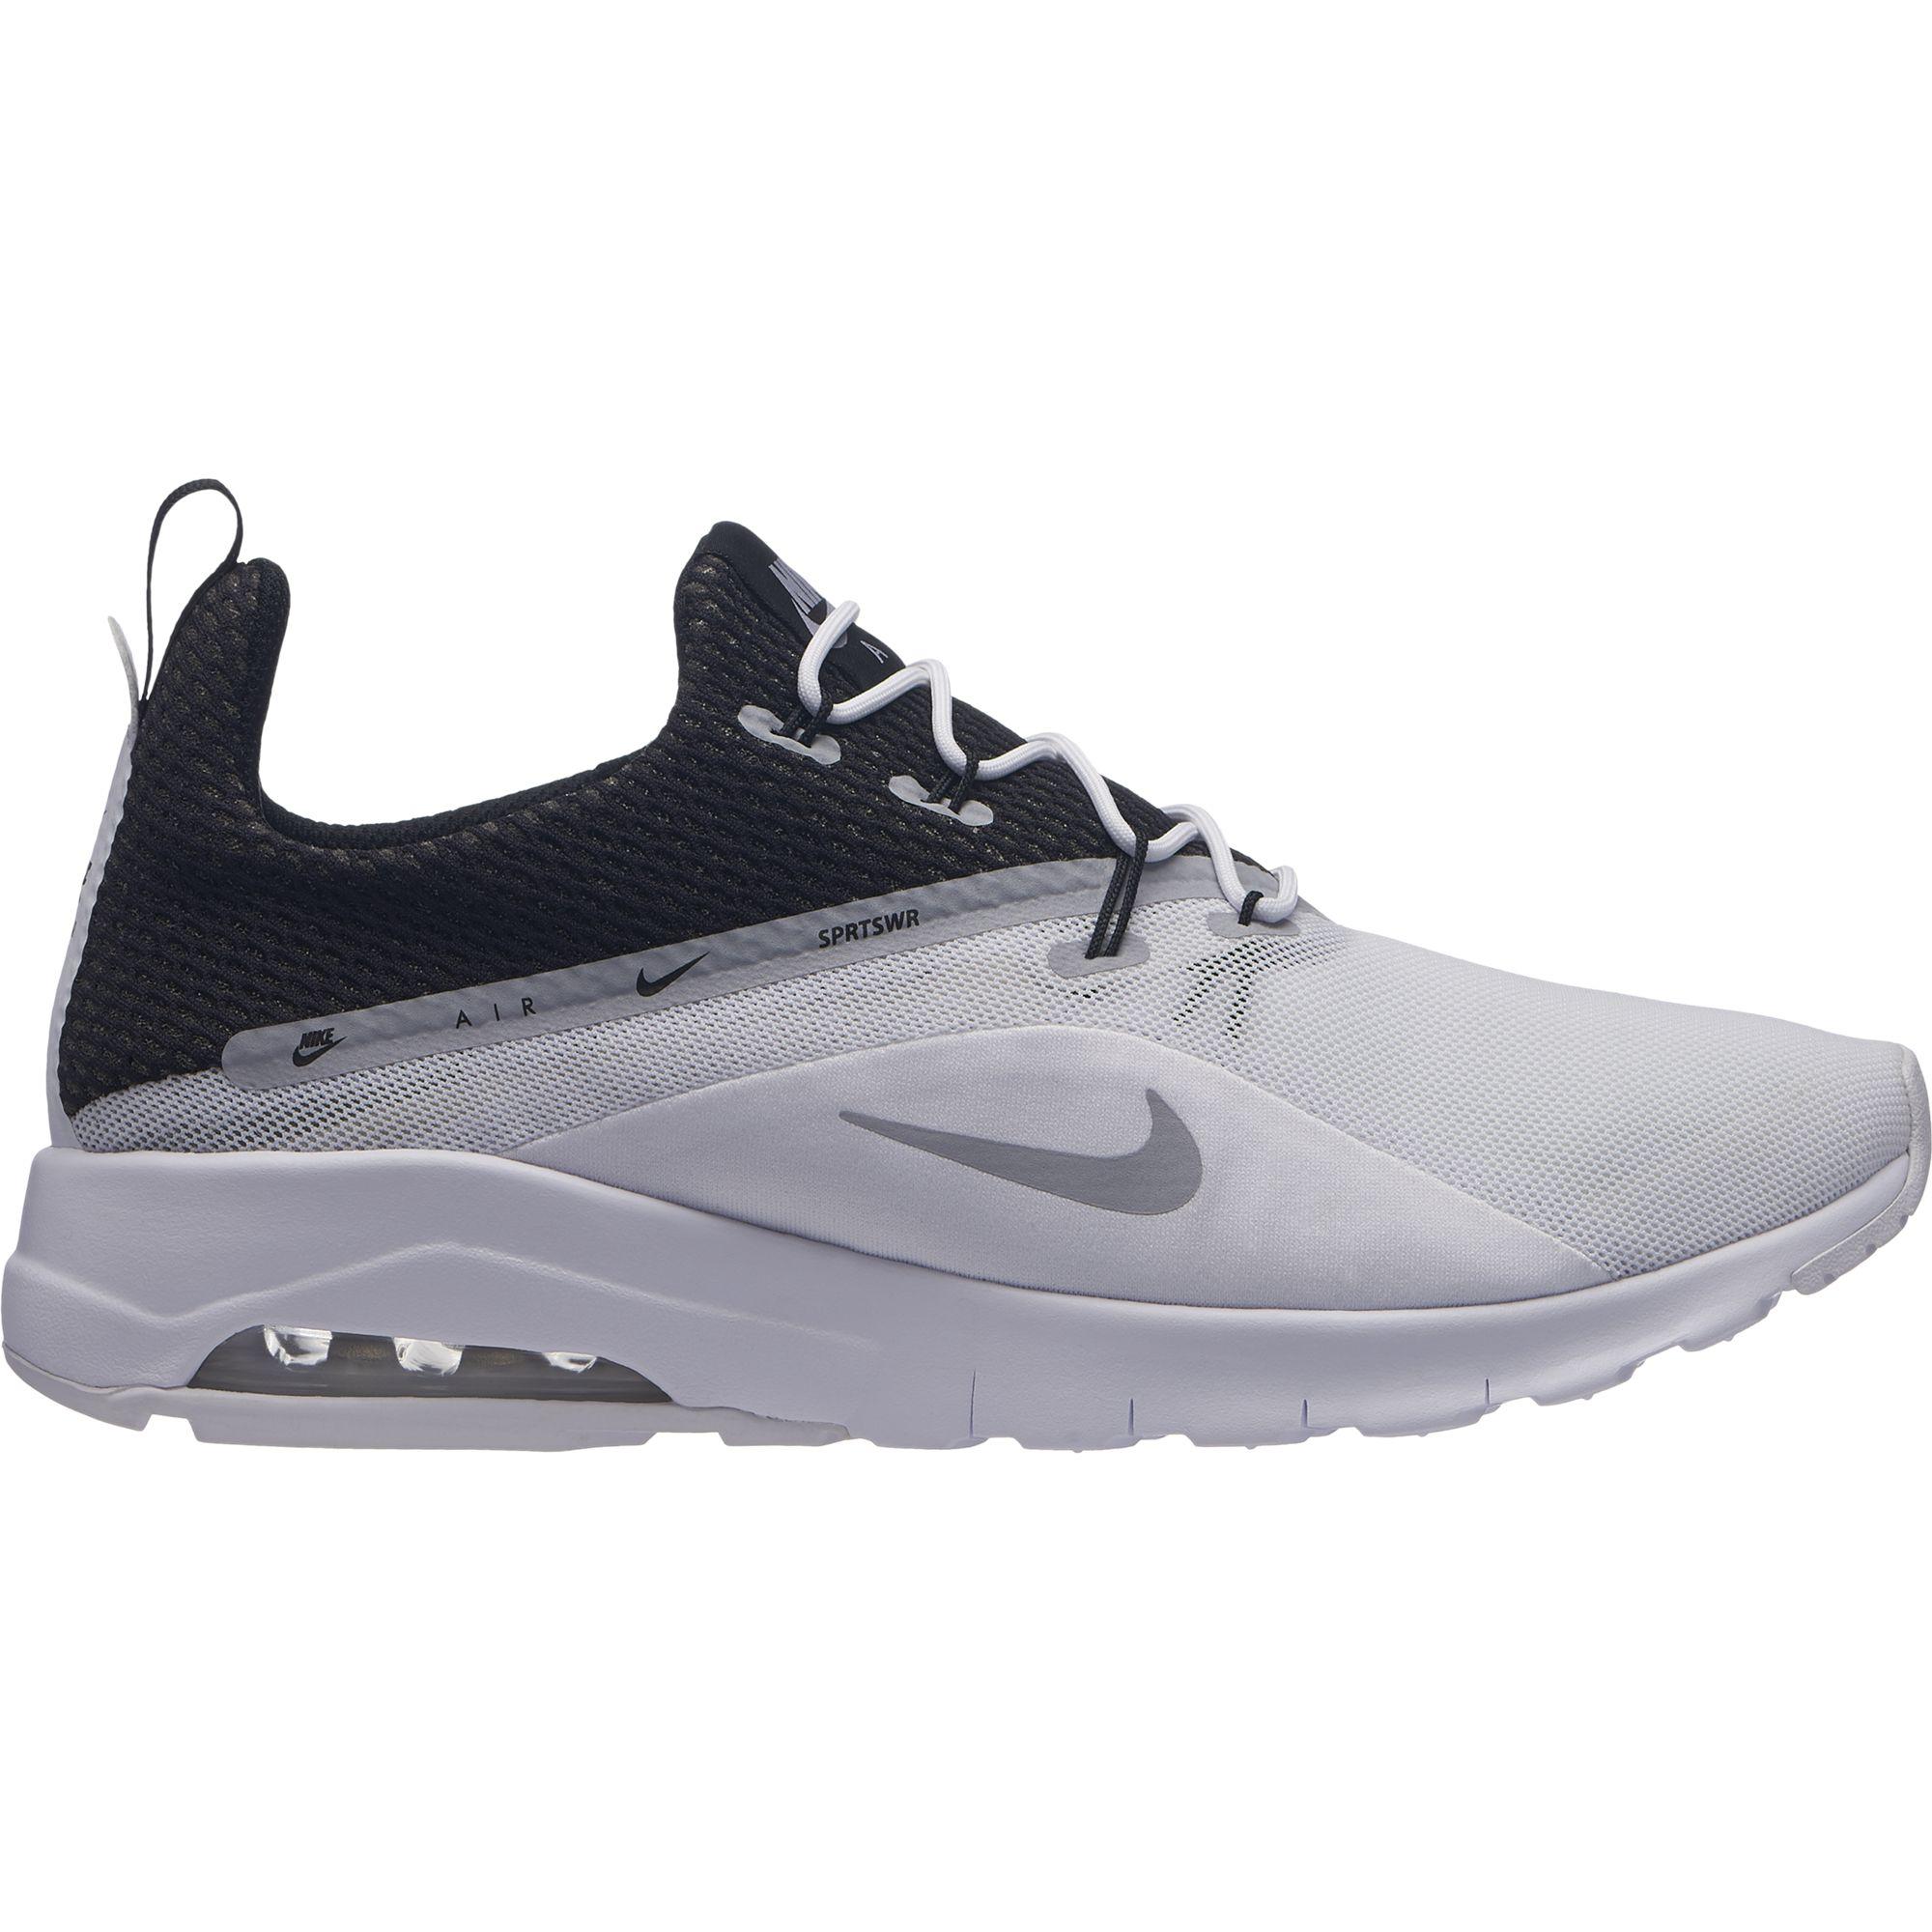 74165d80449f0 Nike Men s Air Max Motion Racer 2 Running Shoe